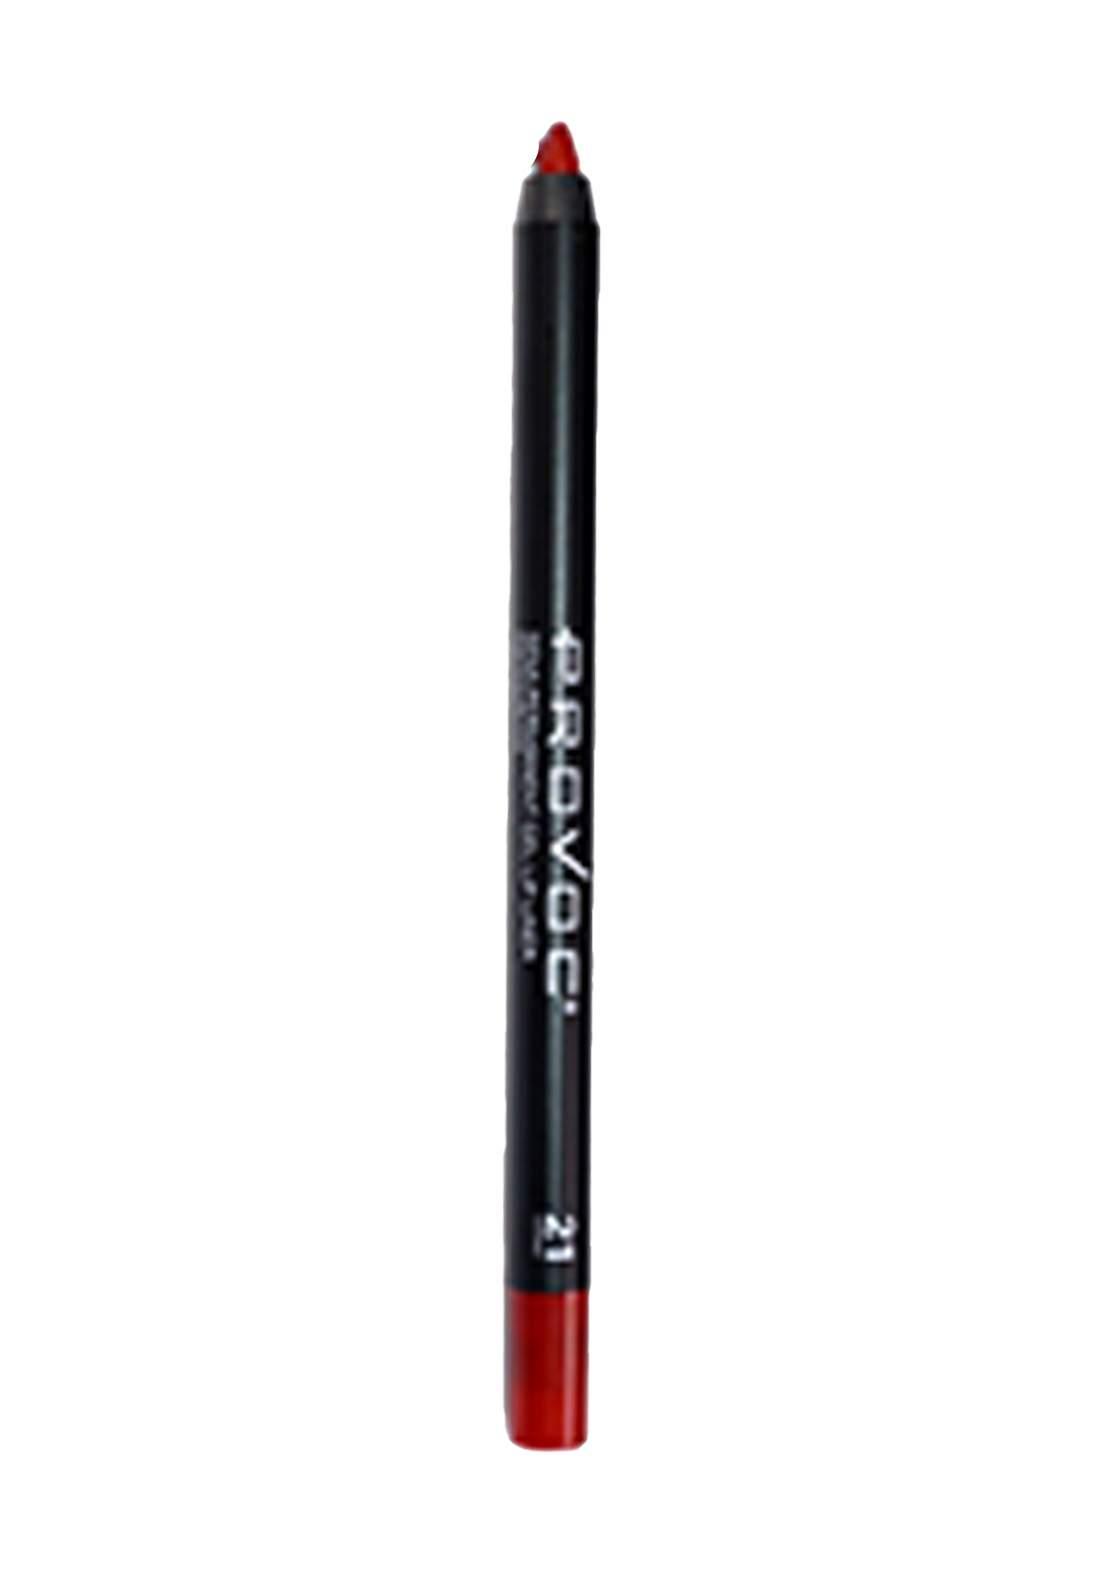 Provoc 353-0033 Semi Permanent Gel Lip Liner Pencil No.12 Bombshell  محدد الشفاه